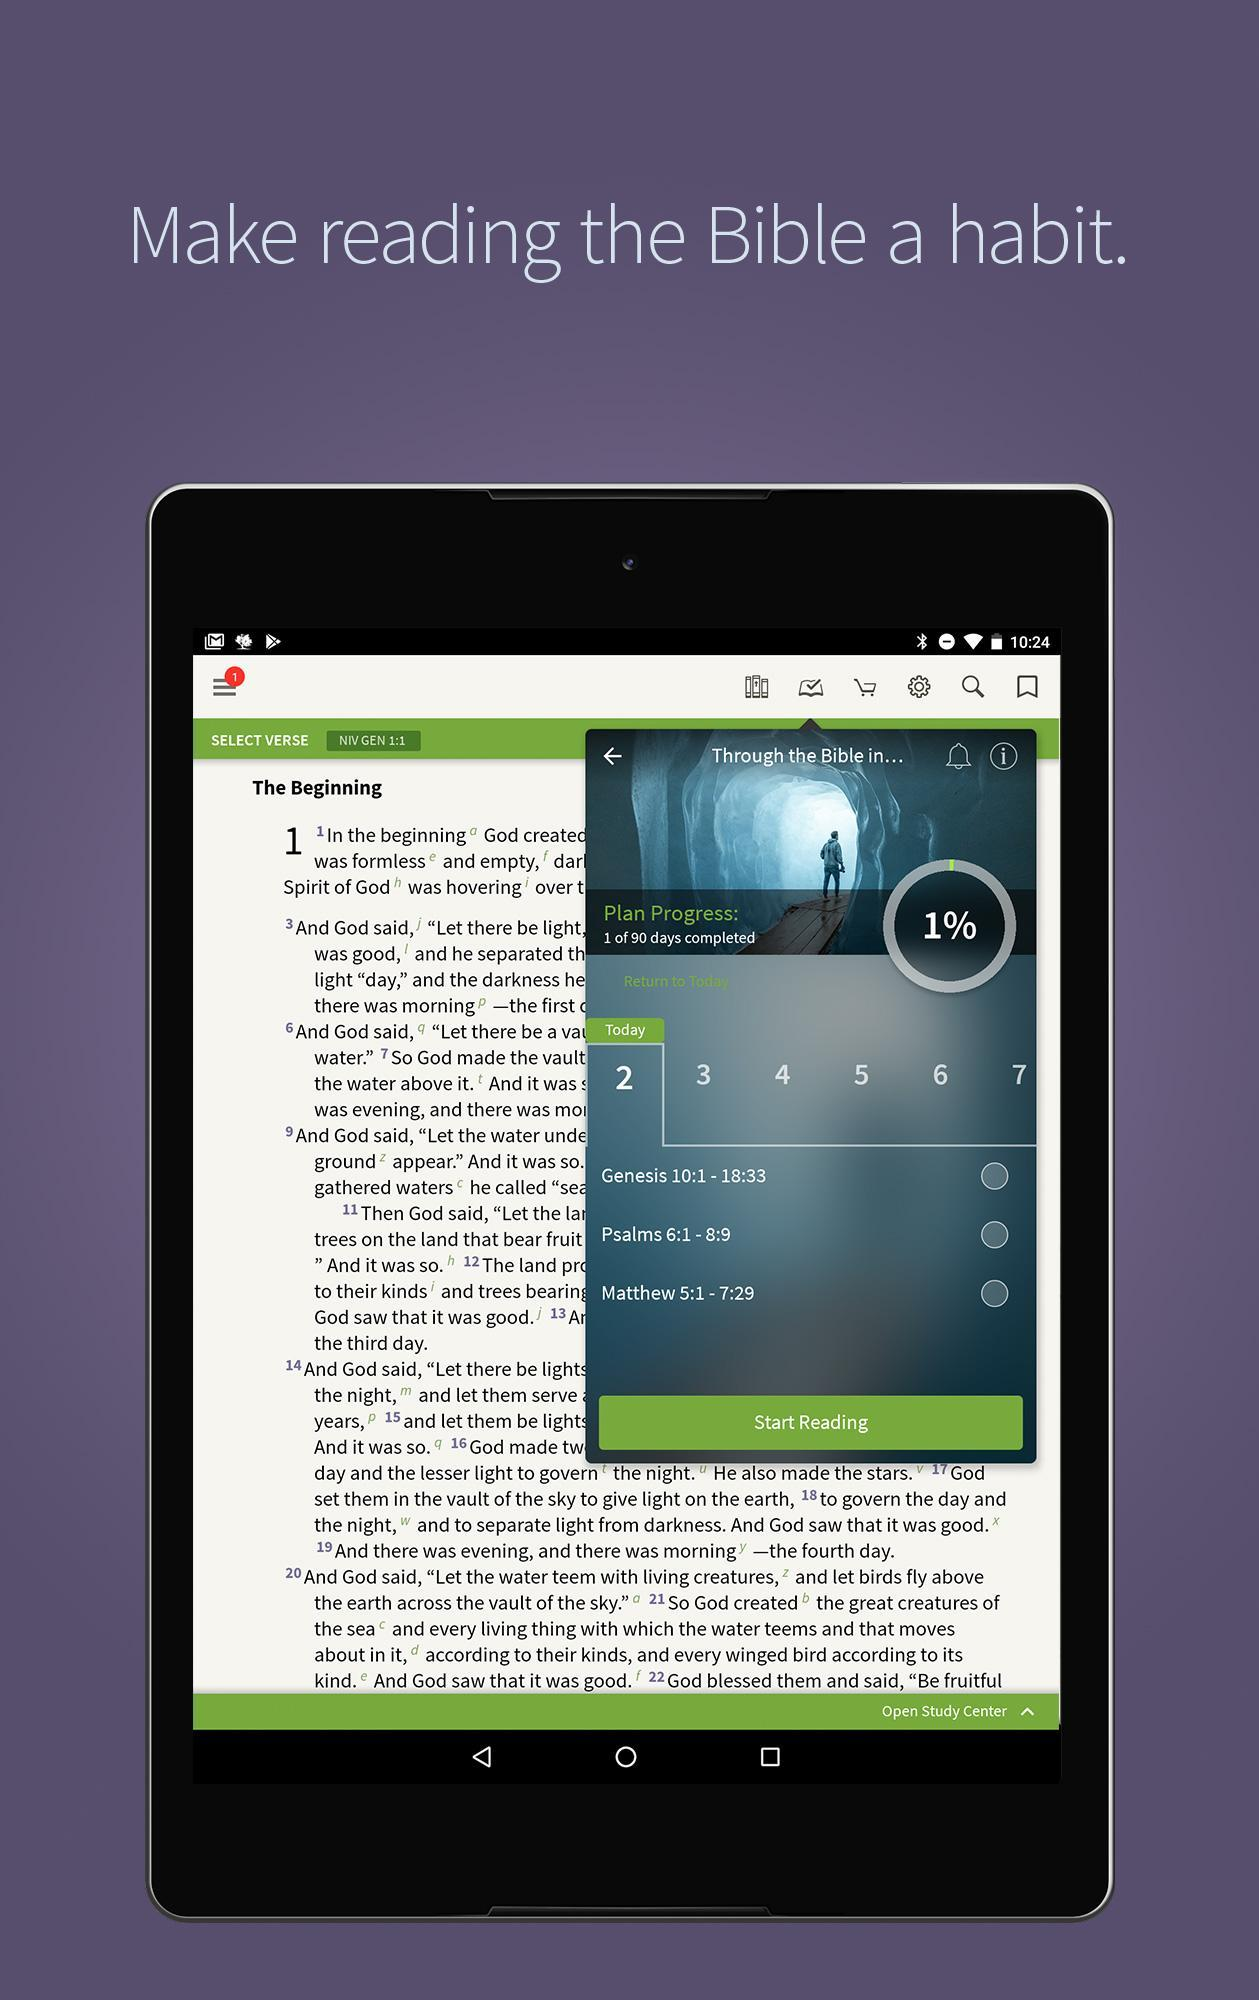 Bible App by Olive Tree 7.5.4.0.5664 Screenshot 20